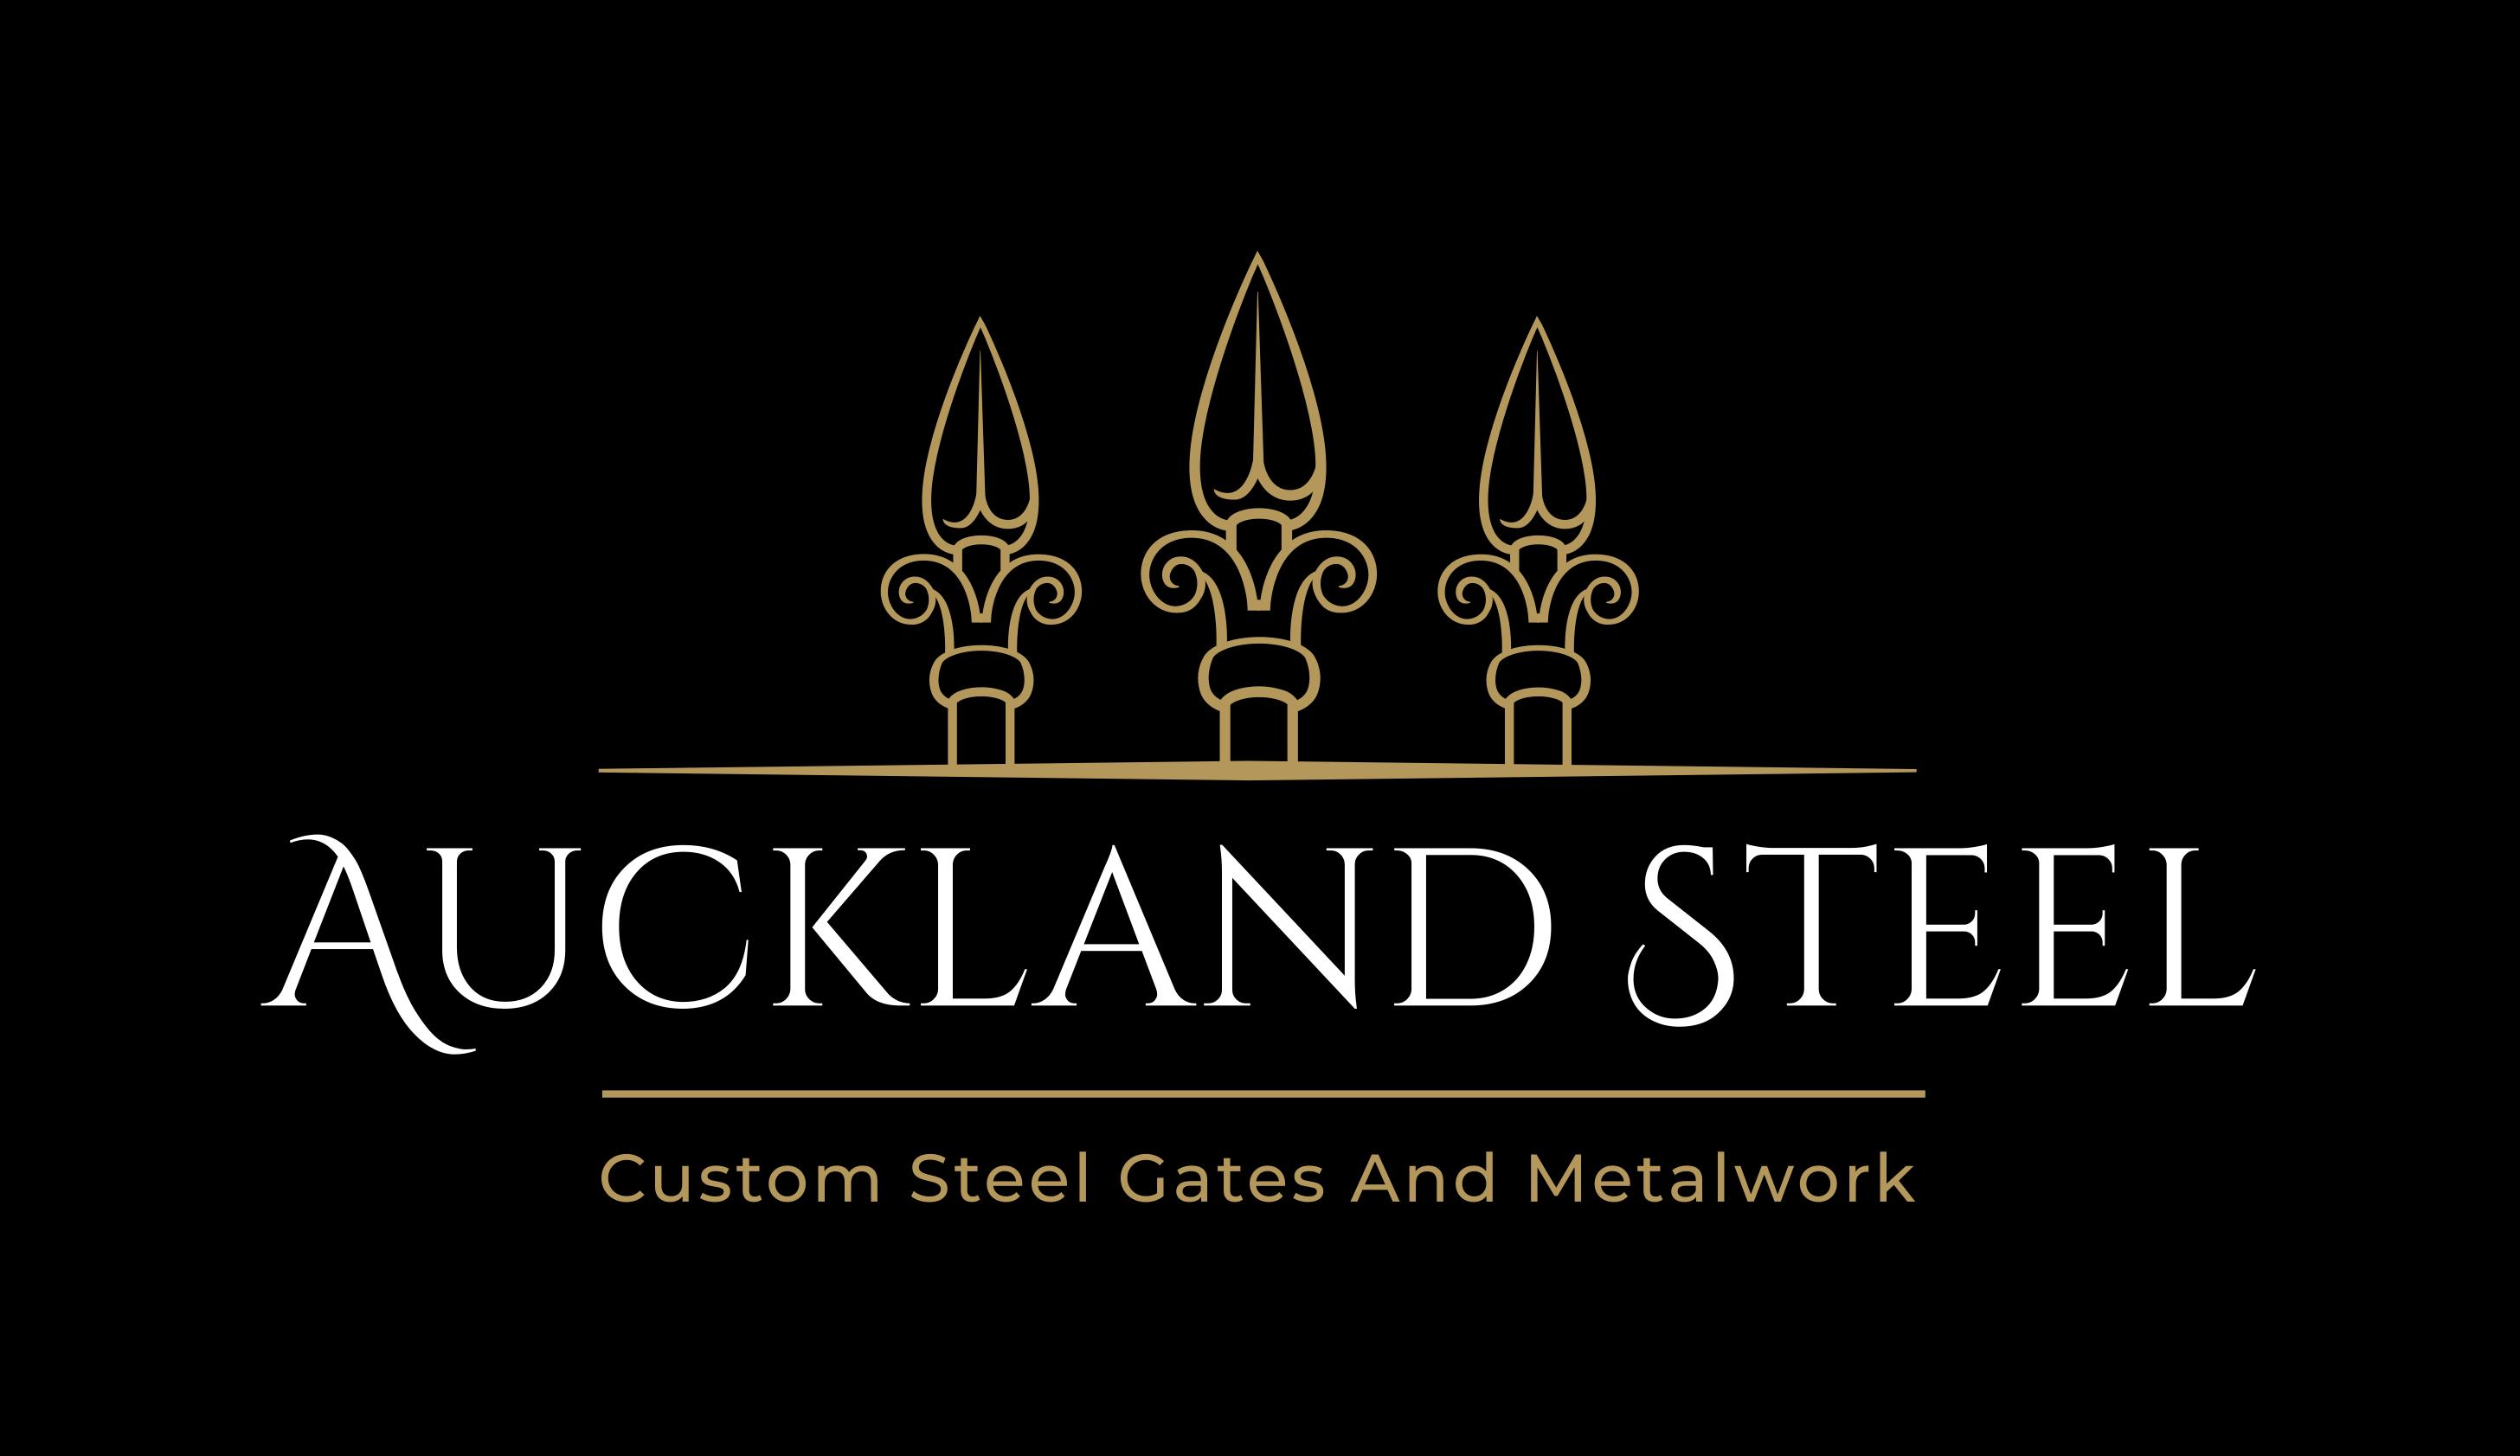 Gates, Fences and Metalwork